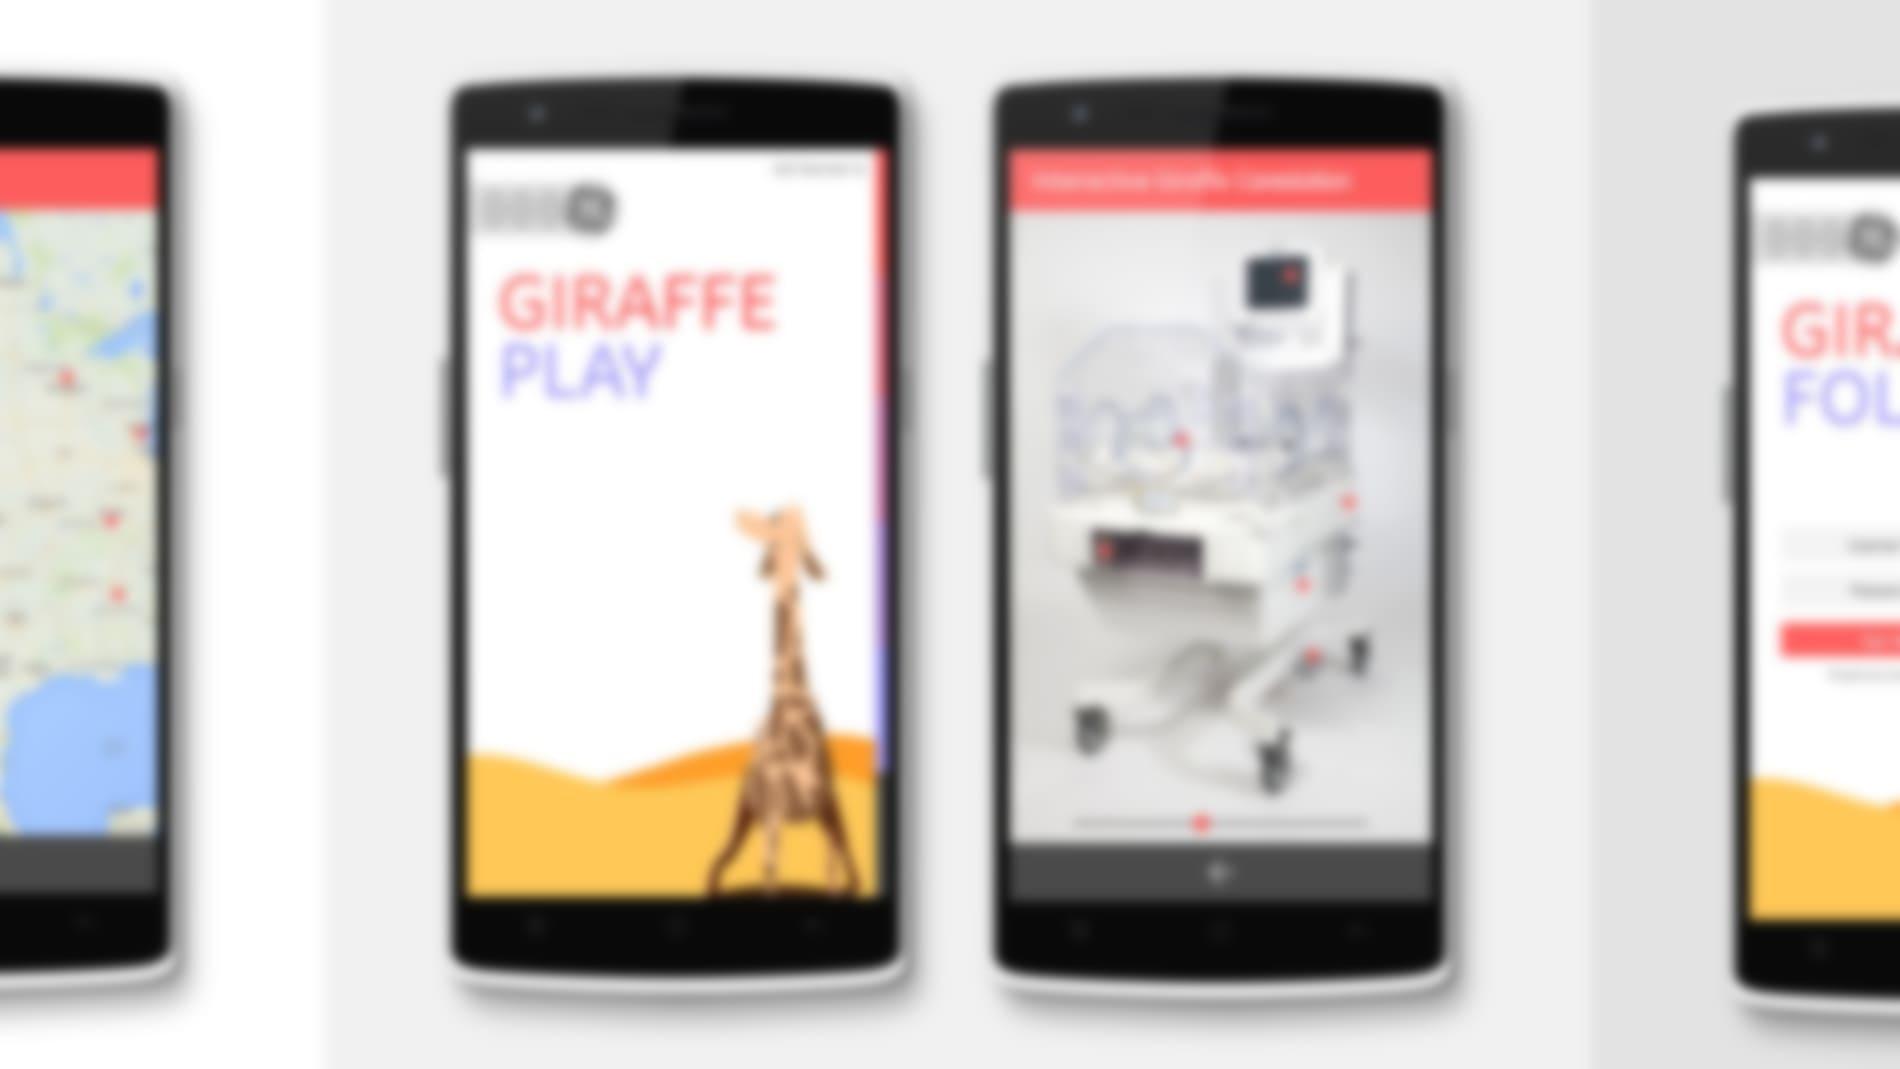 GE Giraffe Carestation Concepts